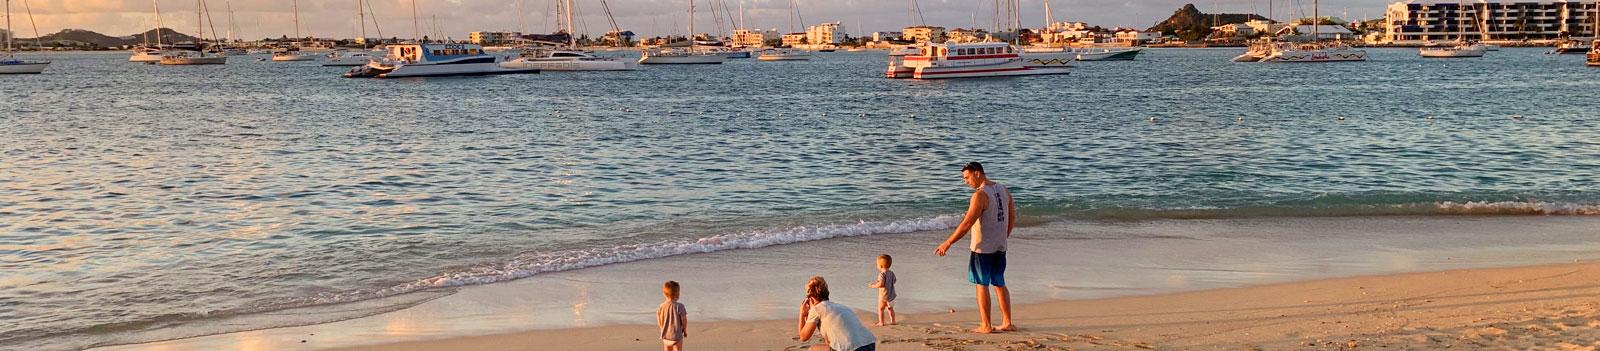 Offres spéciales, Simpson Bay Resort & Marina